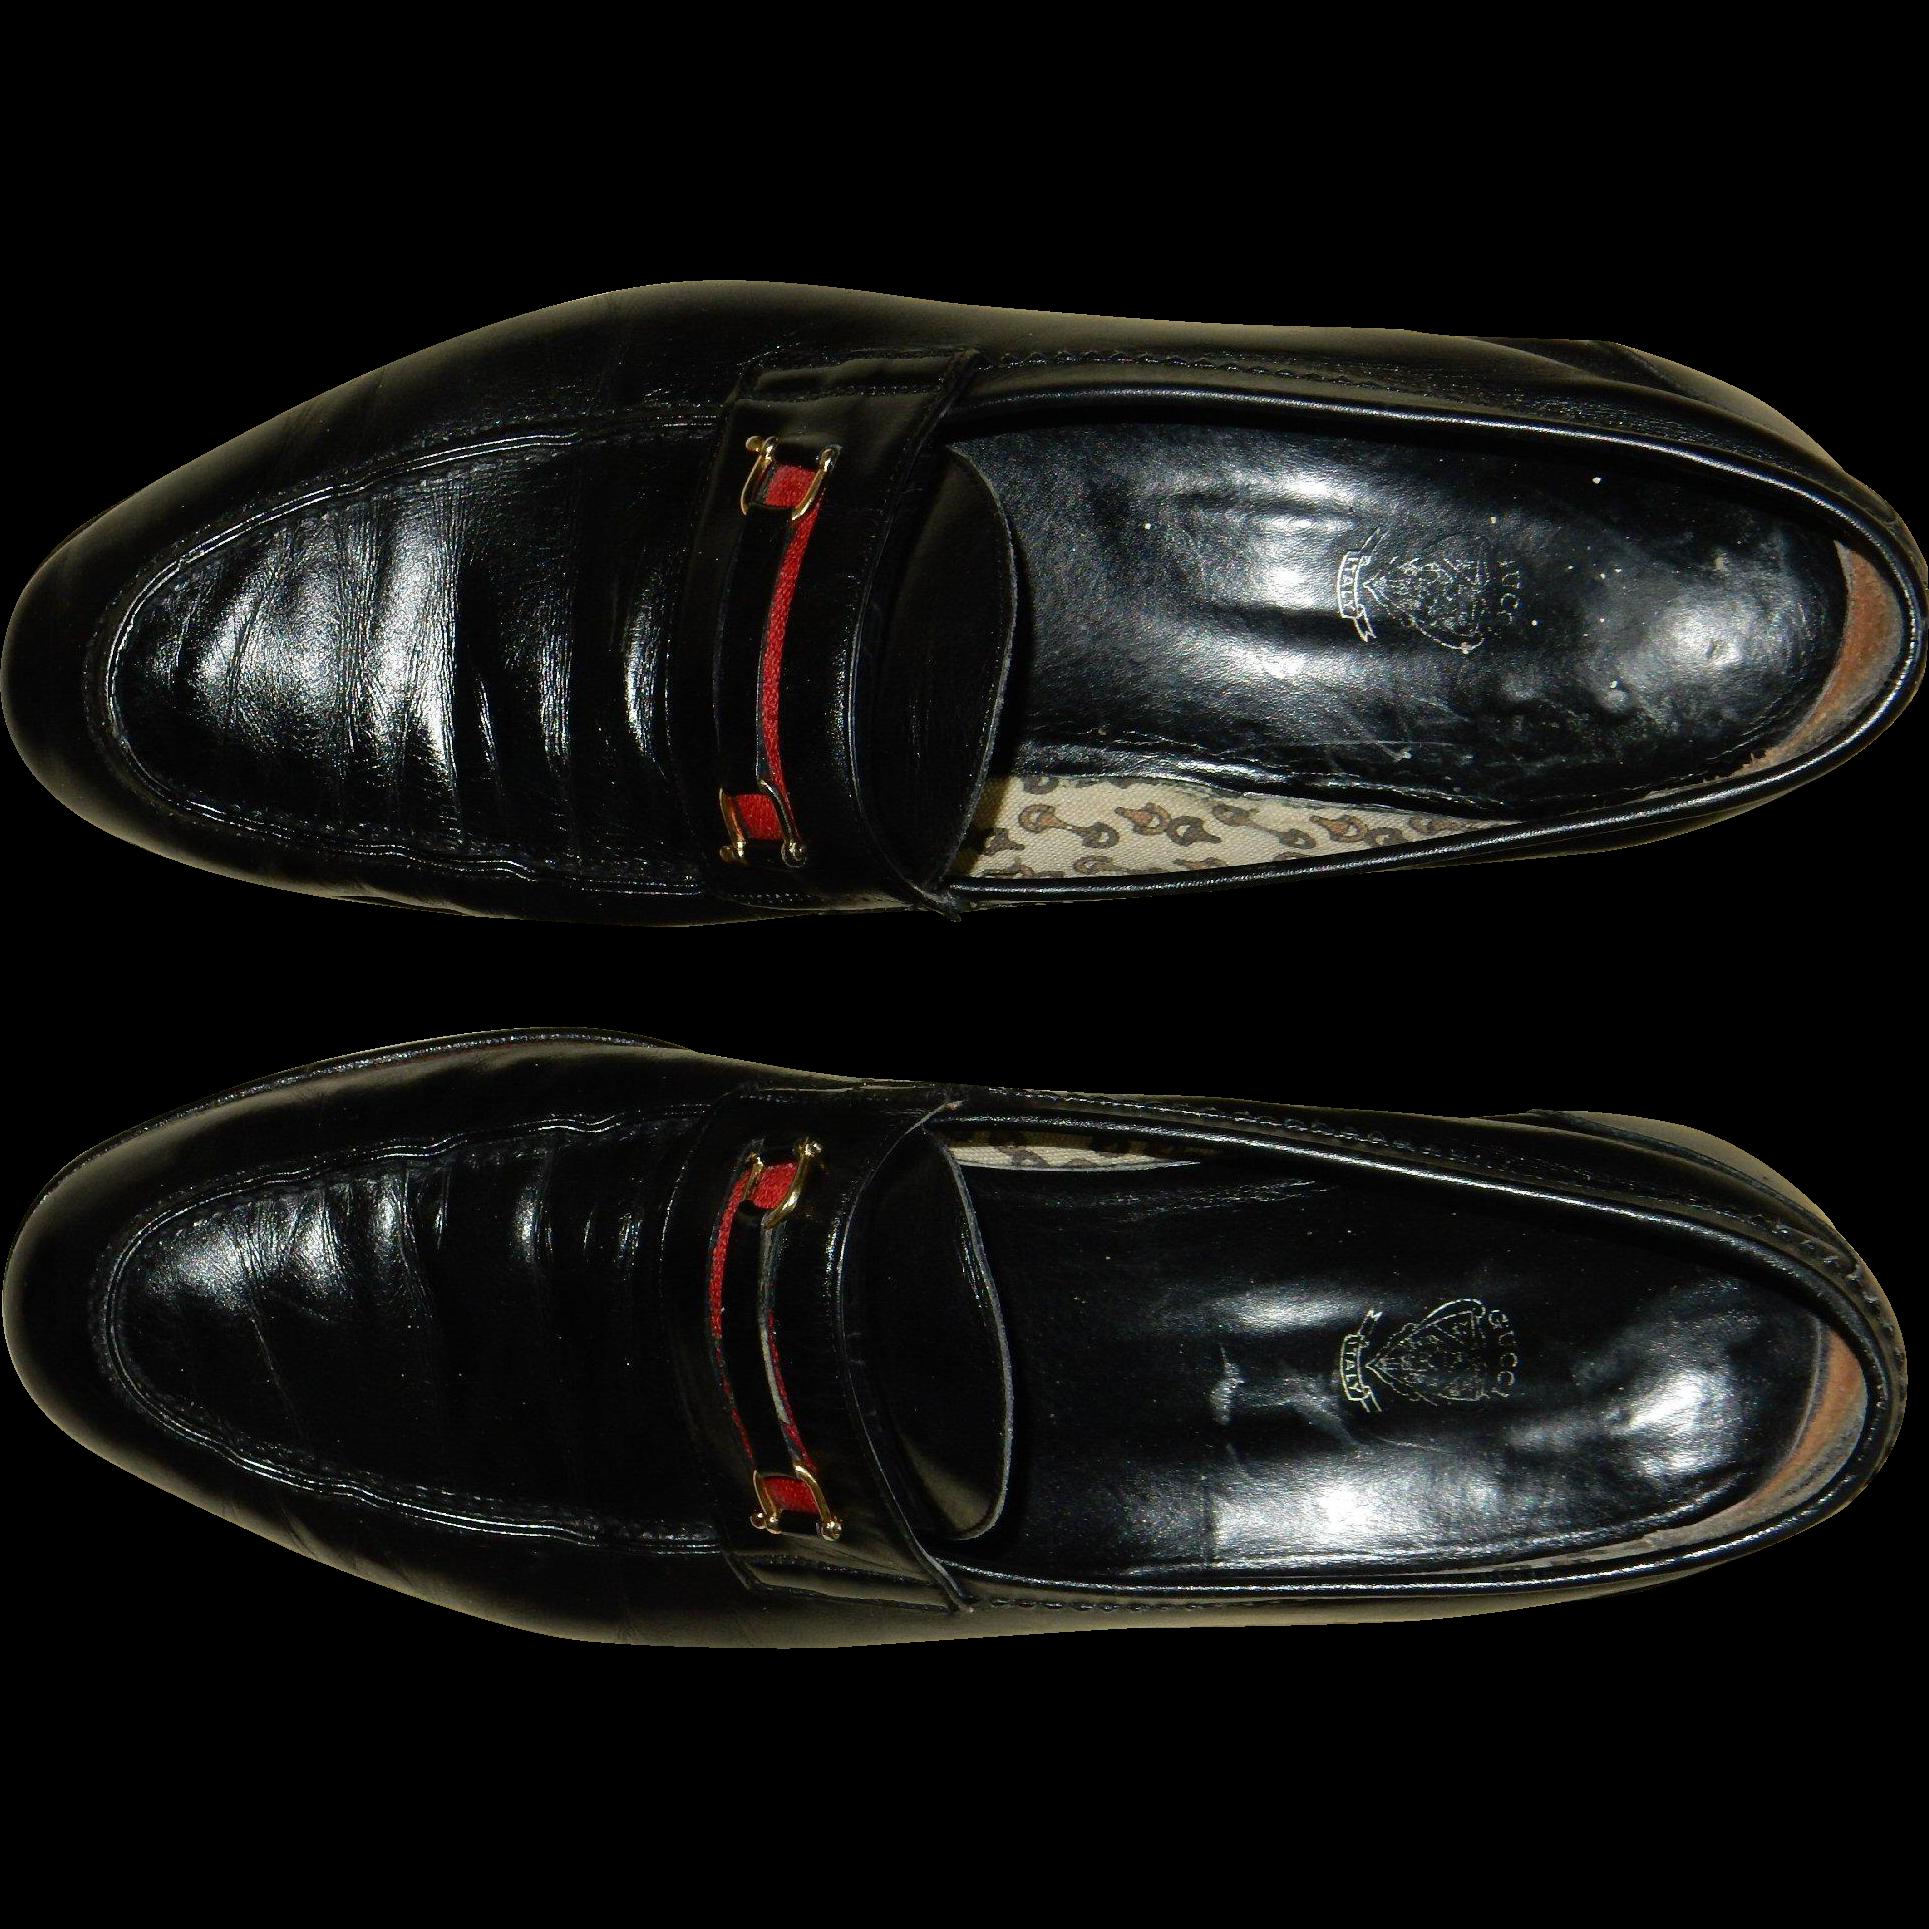 e24f429d5cc97 Gucci Shoes - Mens Loaders - 1980's in 2019 | RL Favorites - Men's ...